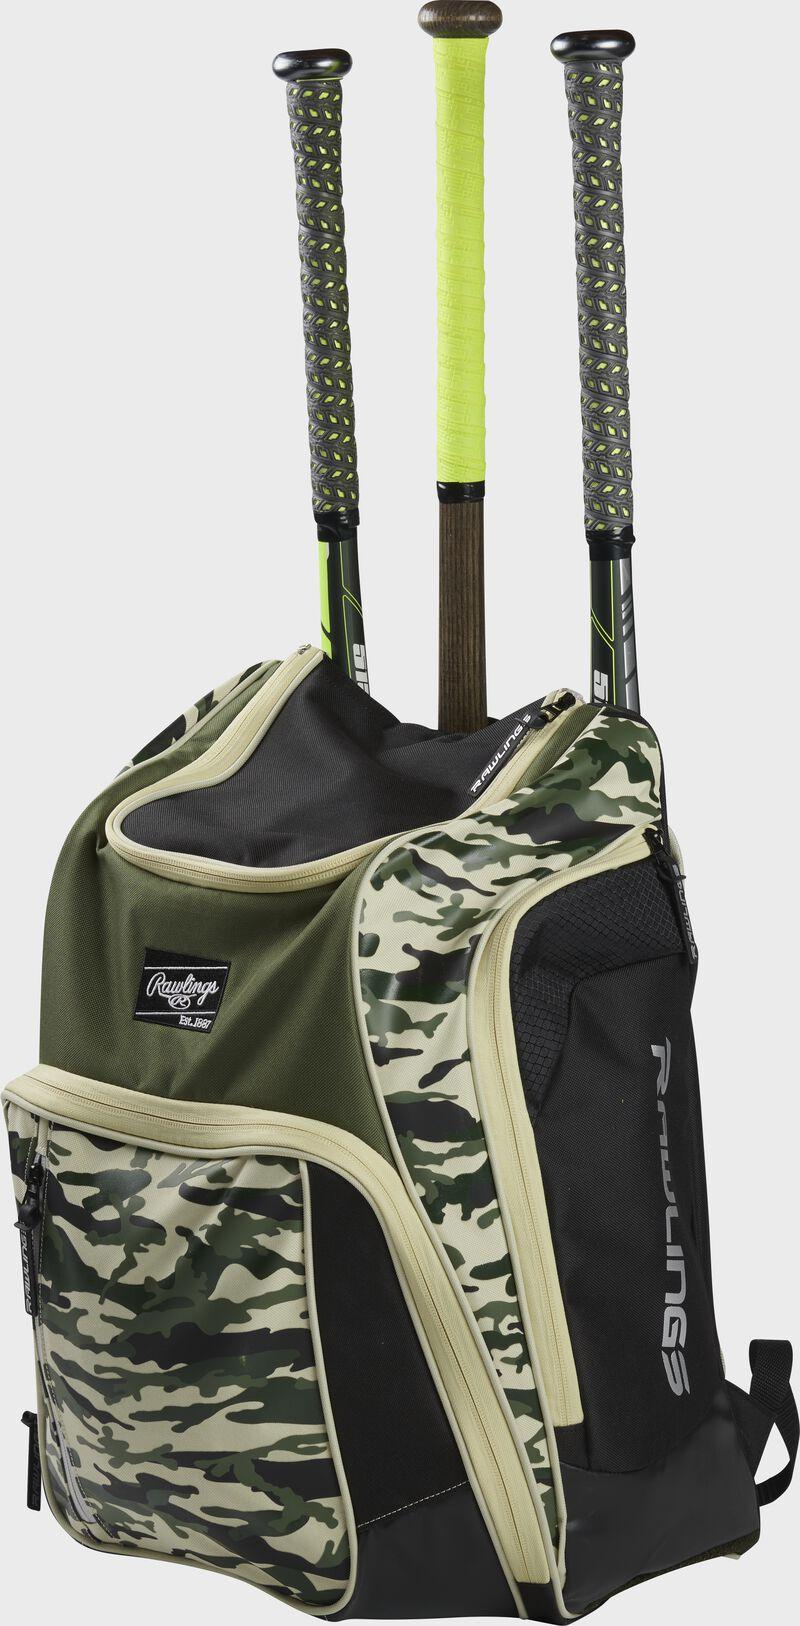 Angle view of a camo Legion baseball bat backpack with 3 bats in the back - SKU: LEGION-CAMO